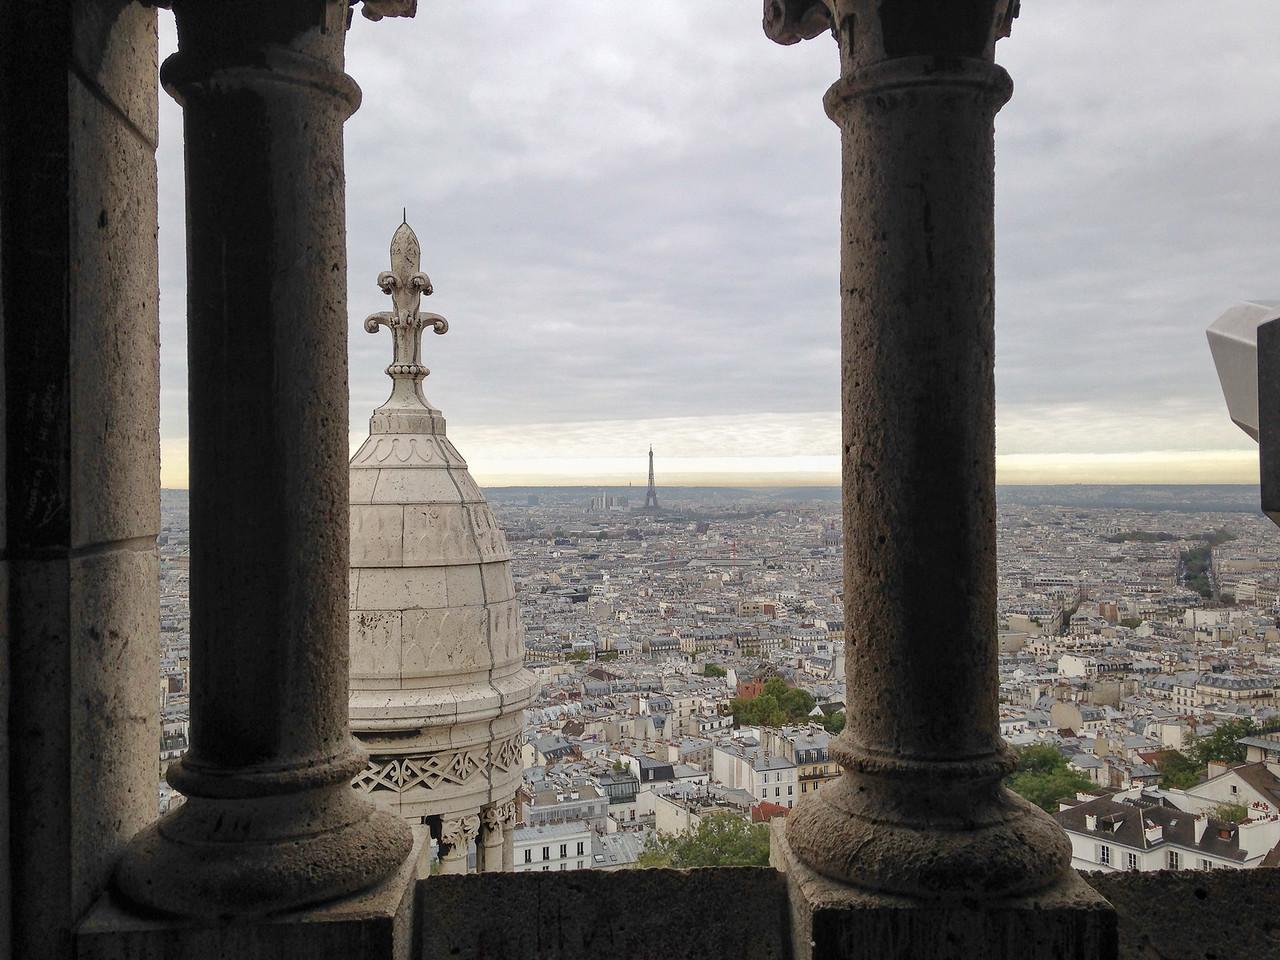 sacre-coeur_view-1156